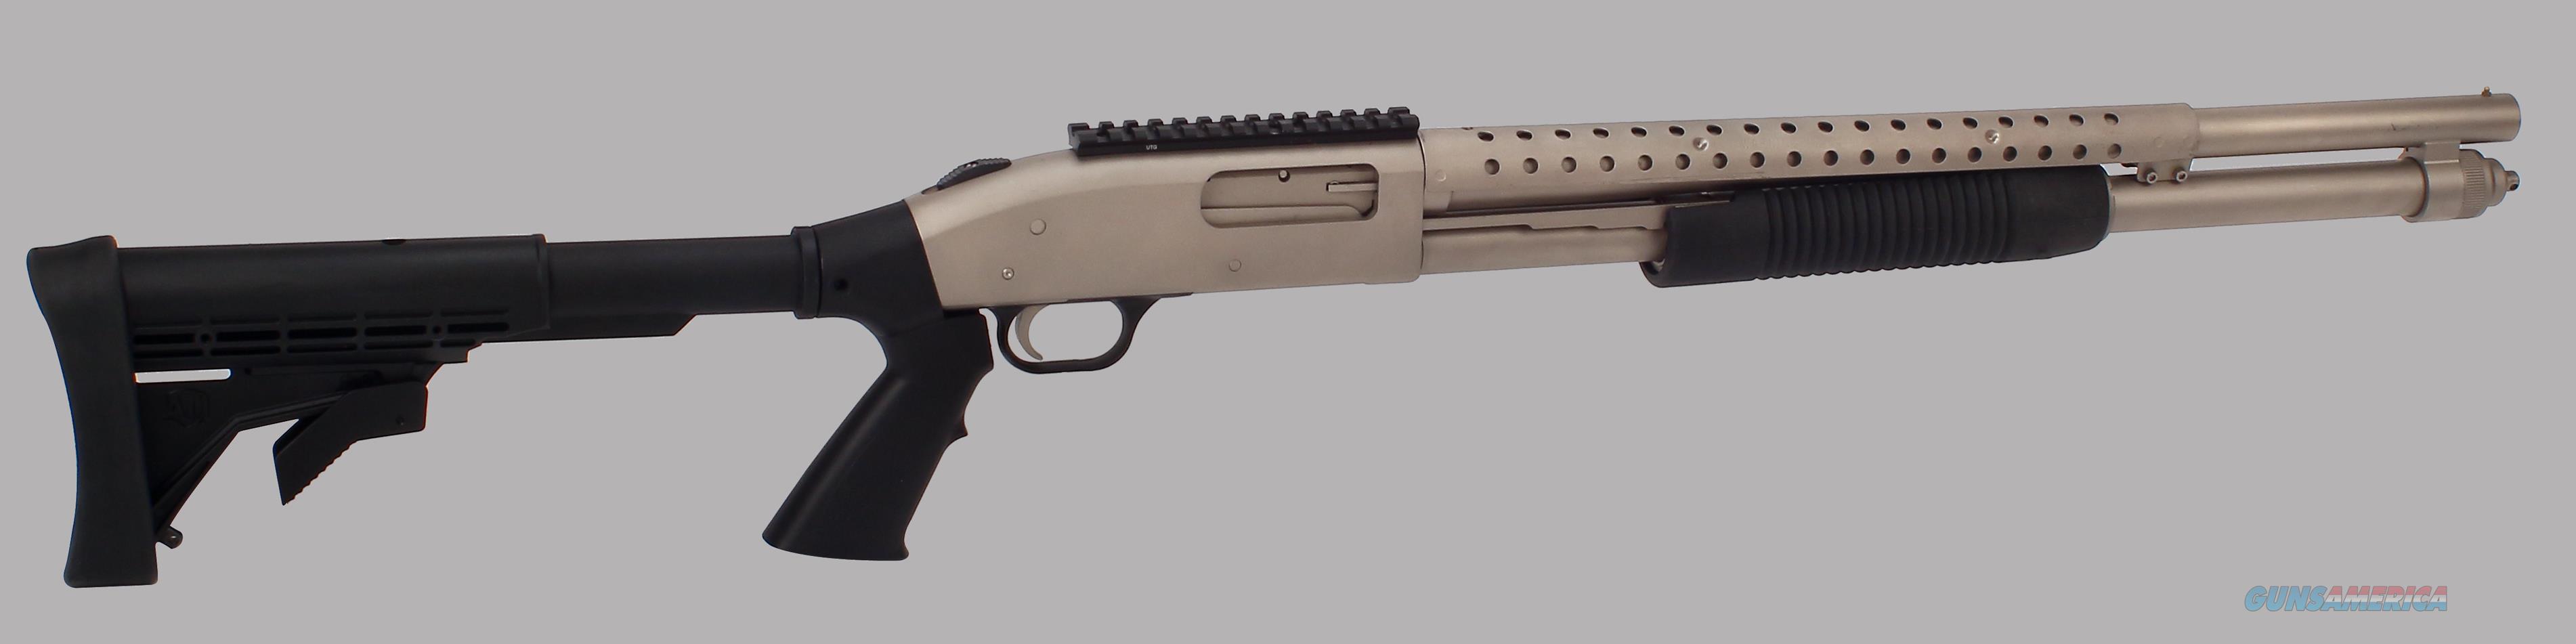 Mossberg 590 Mariner 12ga Pump Shotgun